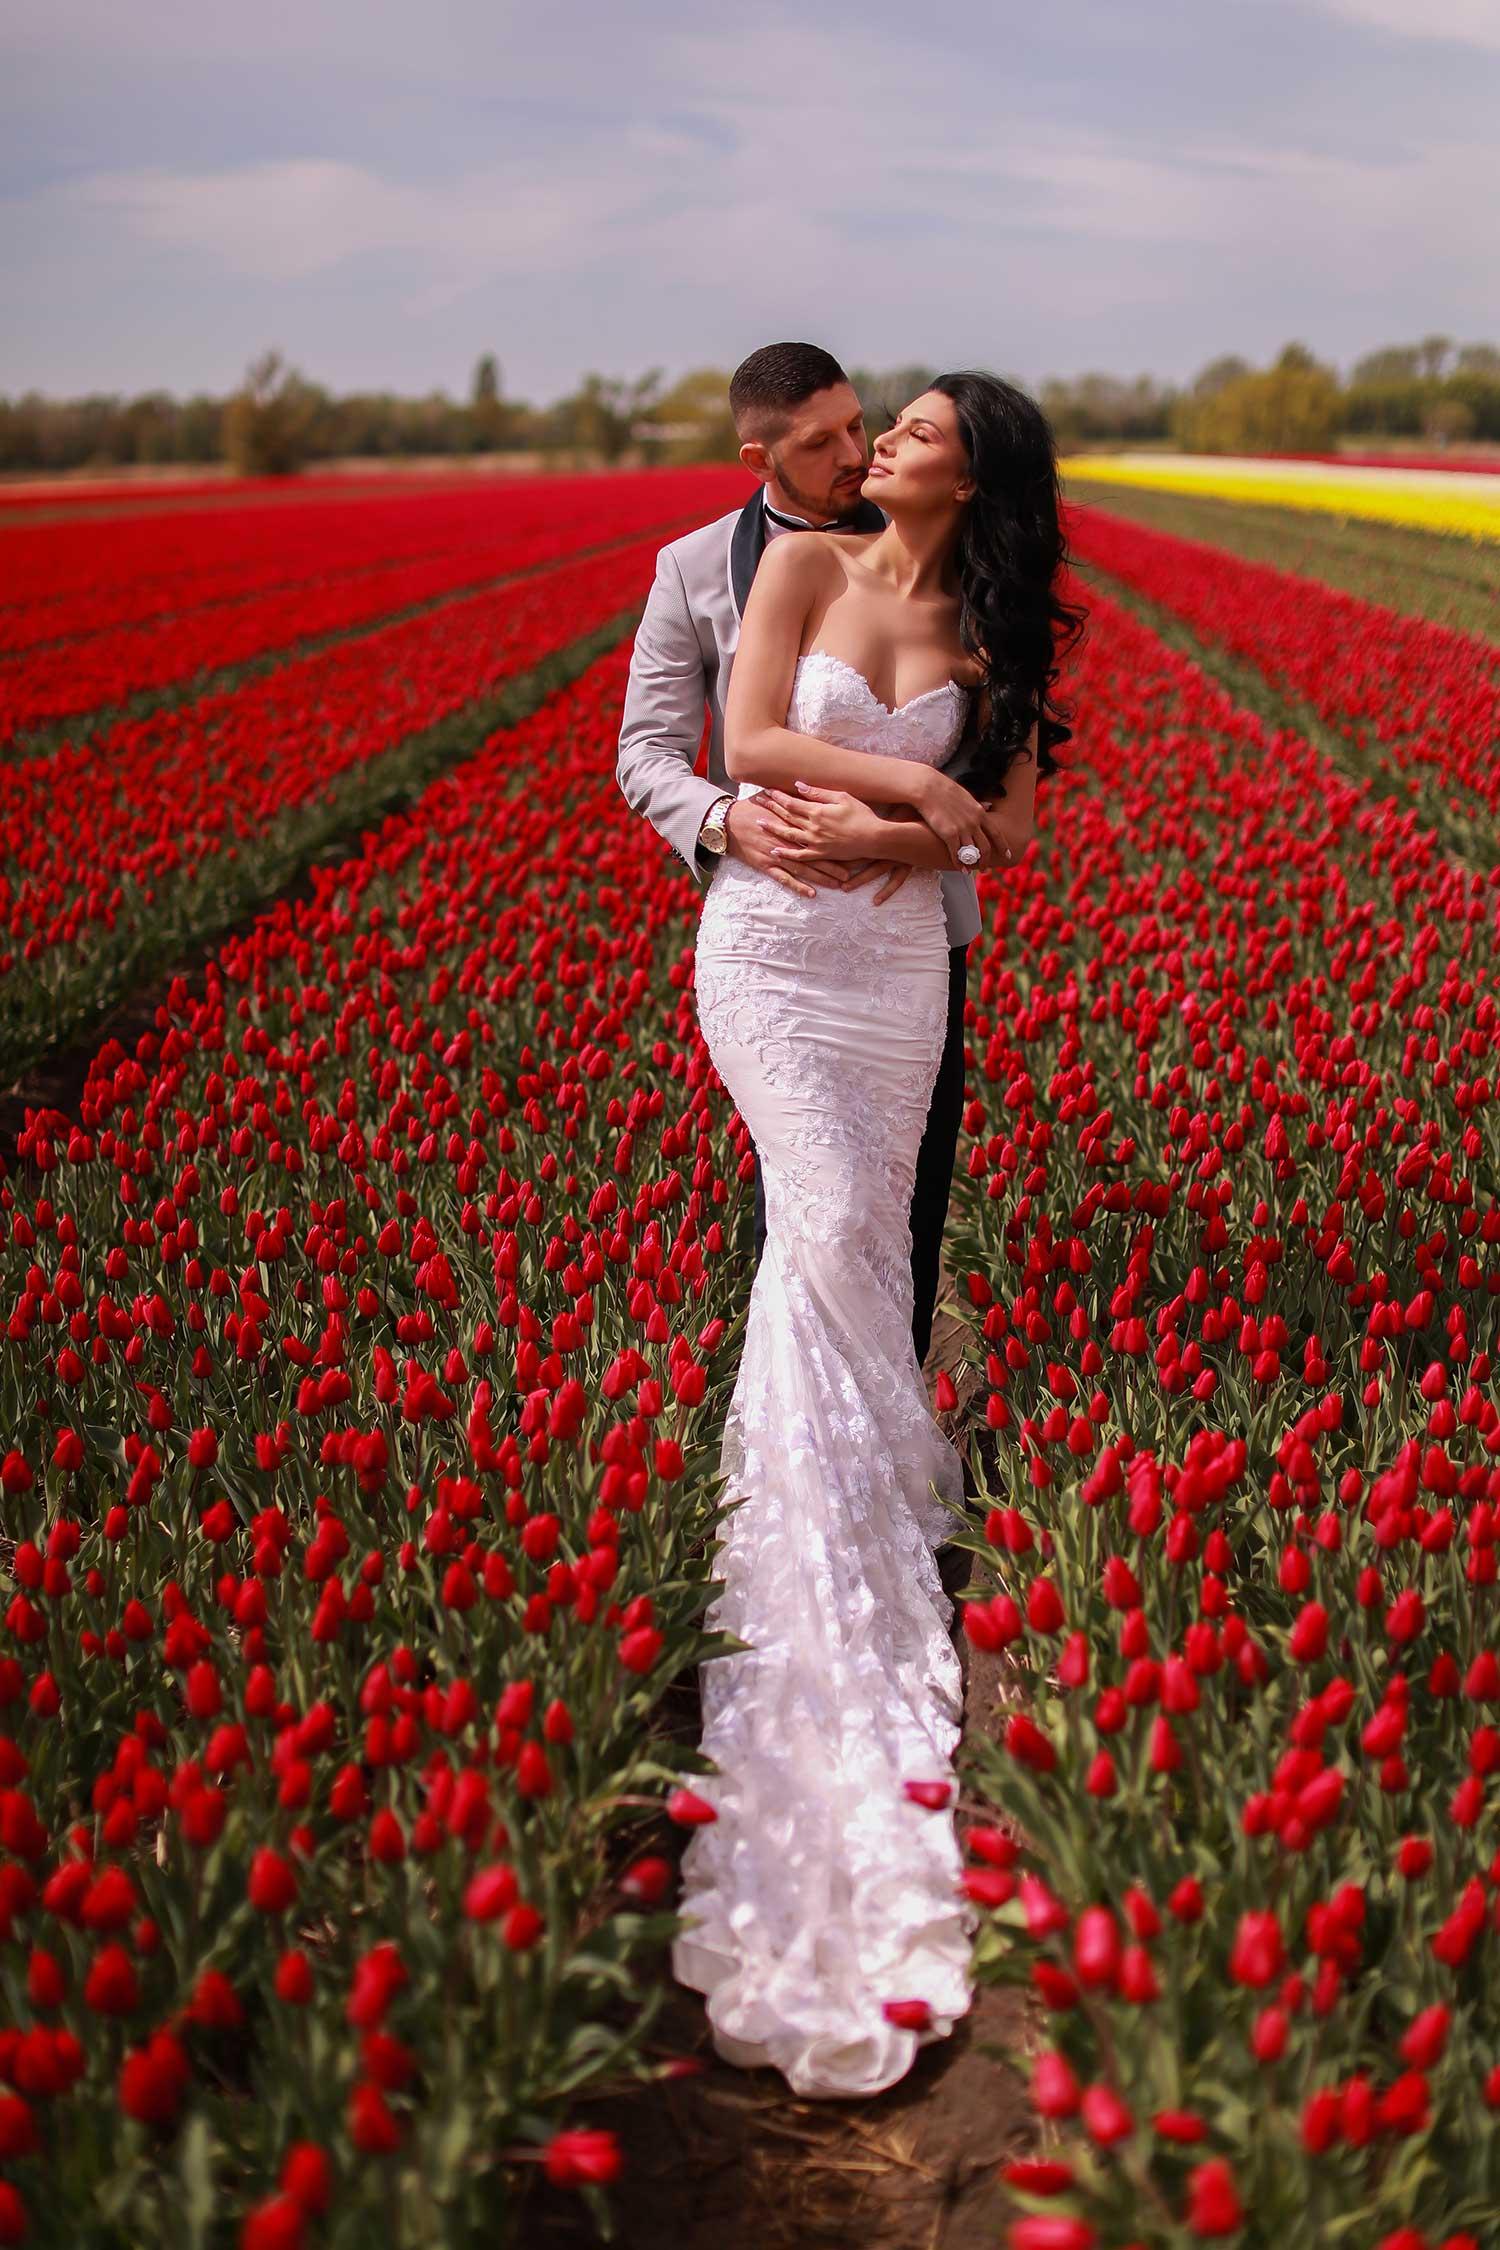 Bride and groom in tulip field